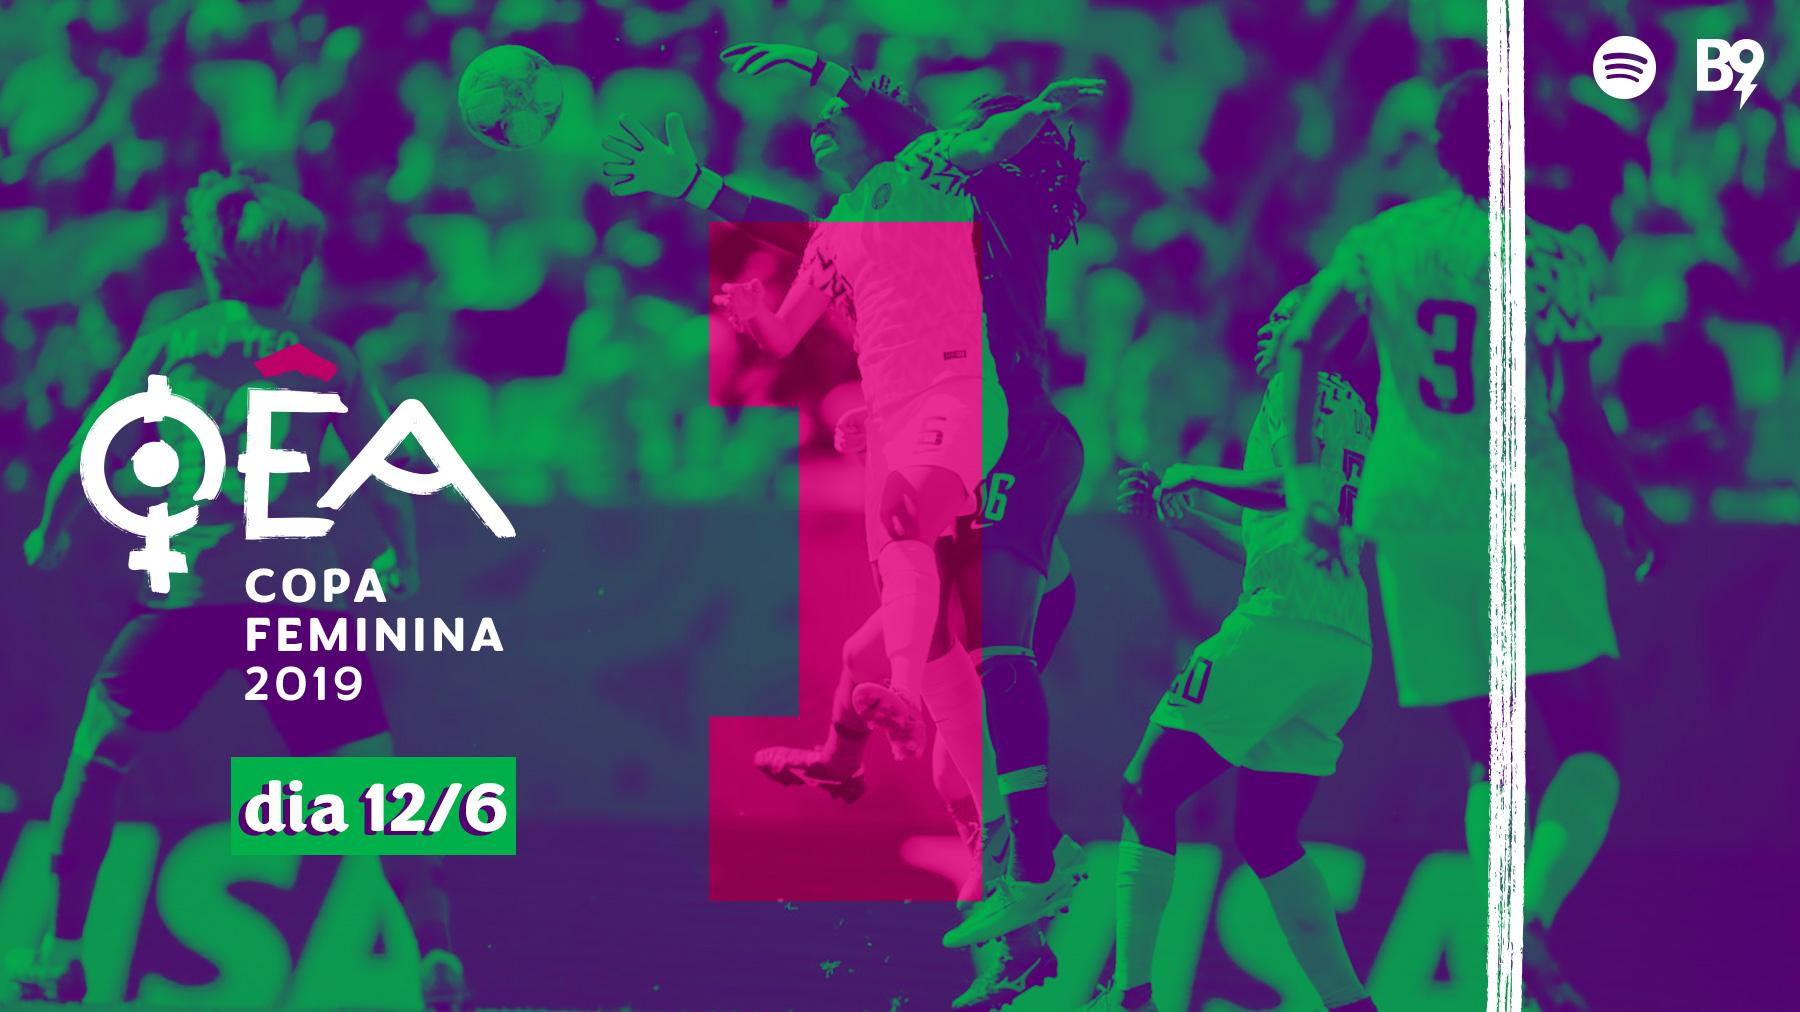 Oêa: Copa 2019 — 🇳🇬 2-0 🇰🇵 / 🇩🇪 1-0 🇪🇸 / 🇫🇷 2-1 🇳🇴